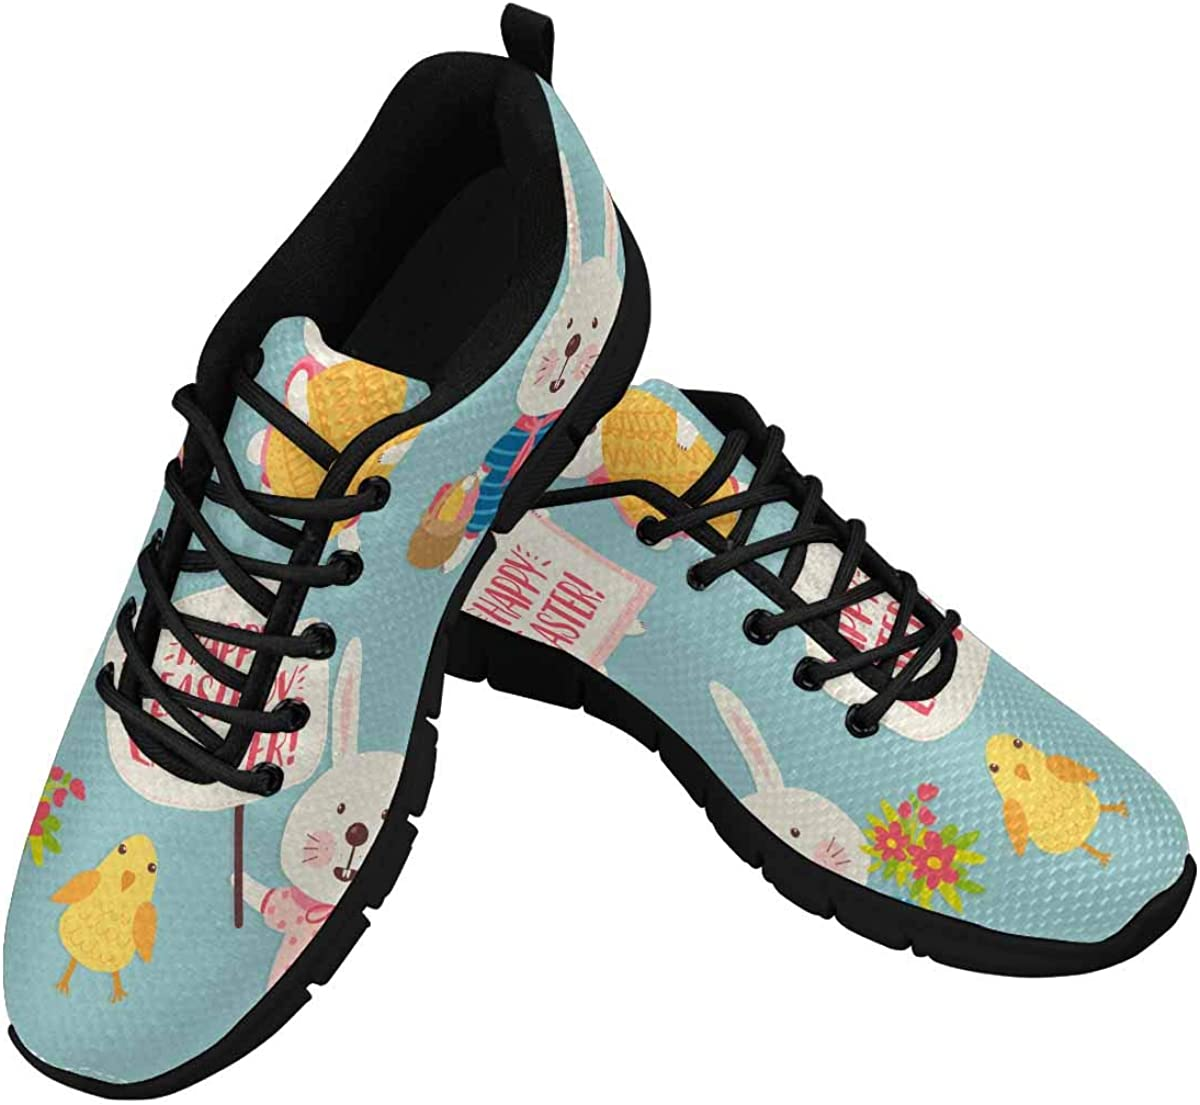 INTERESTPRINT Happy Easter Women's Breathable Non Slip Sneakers